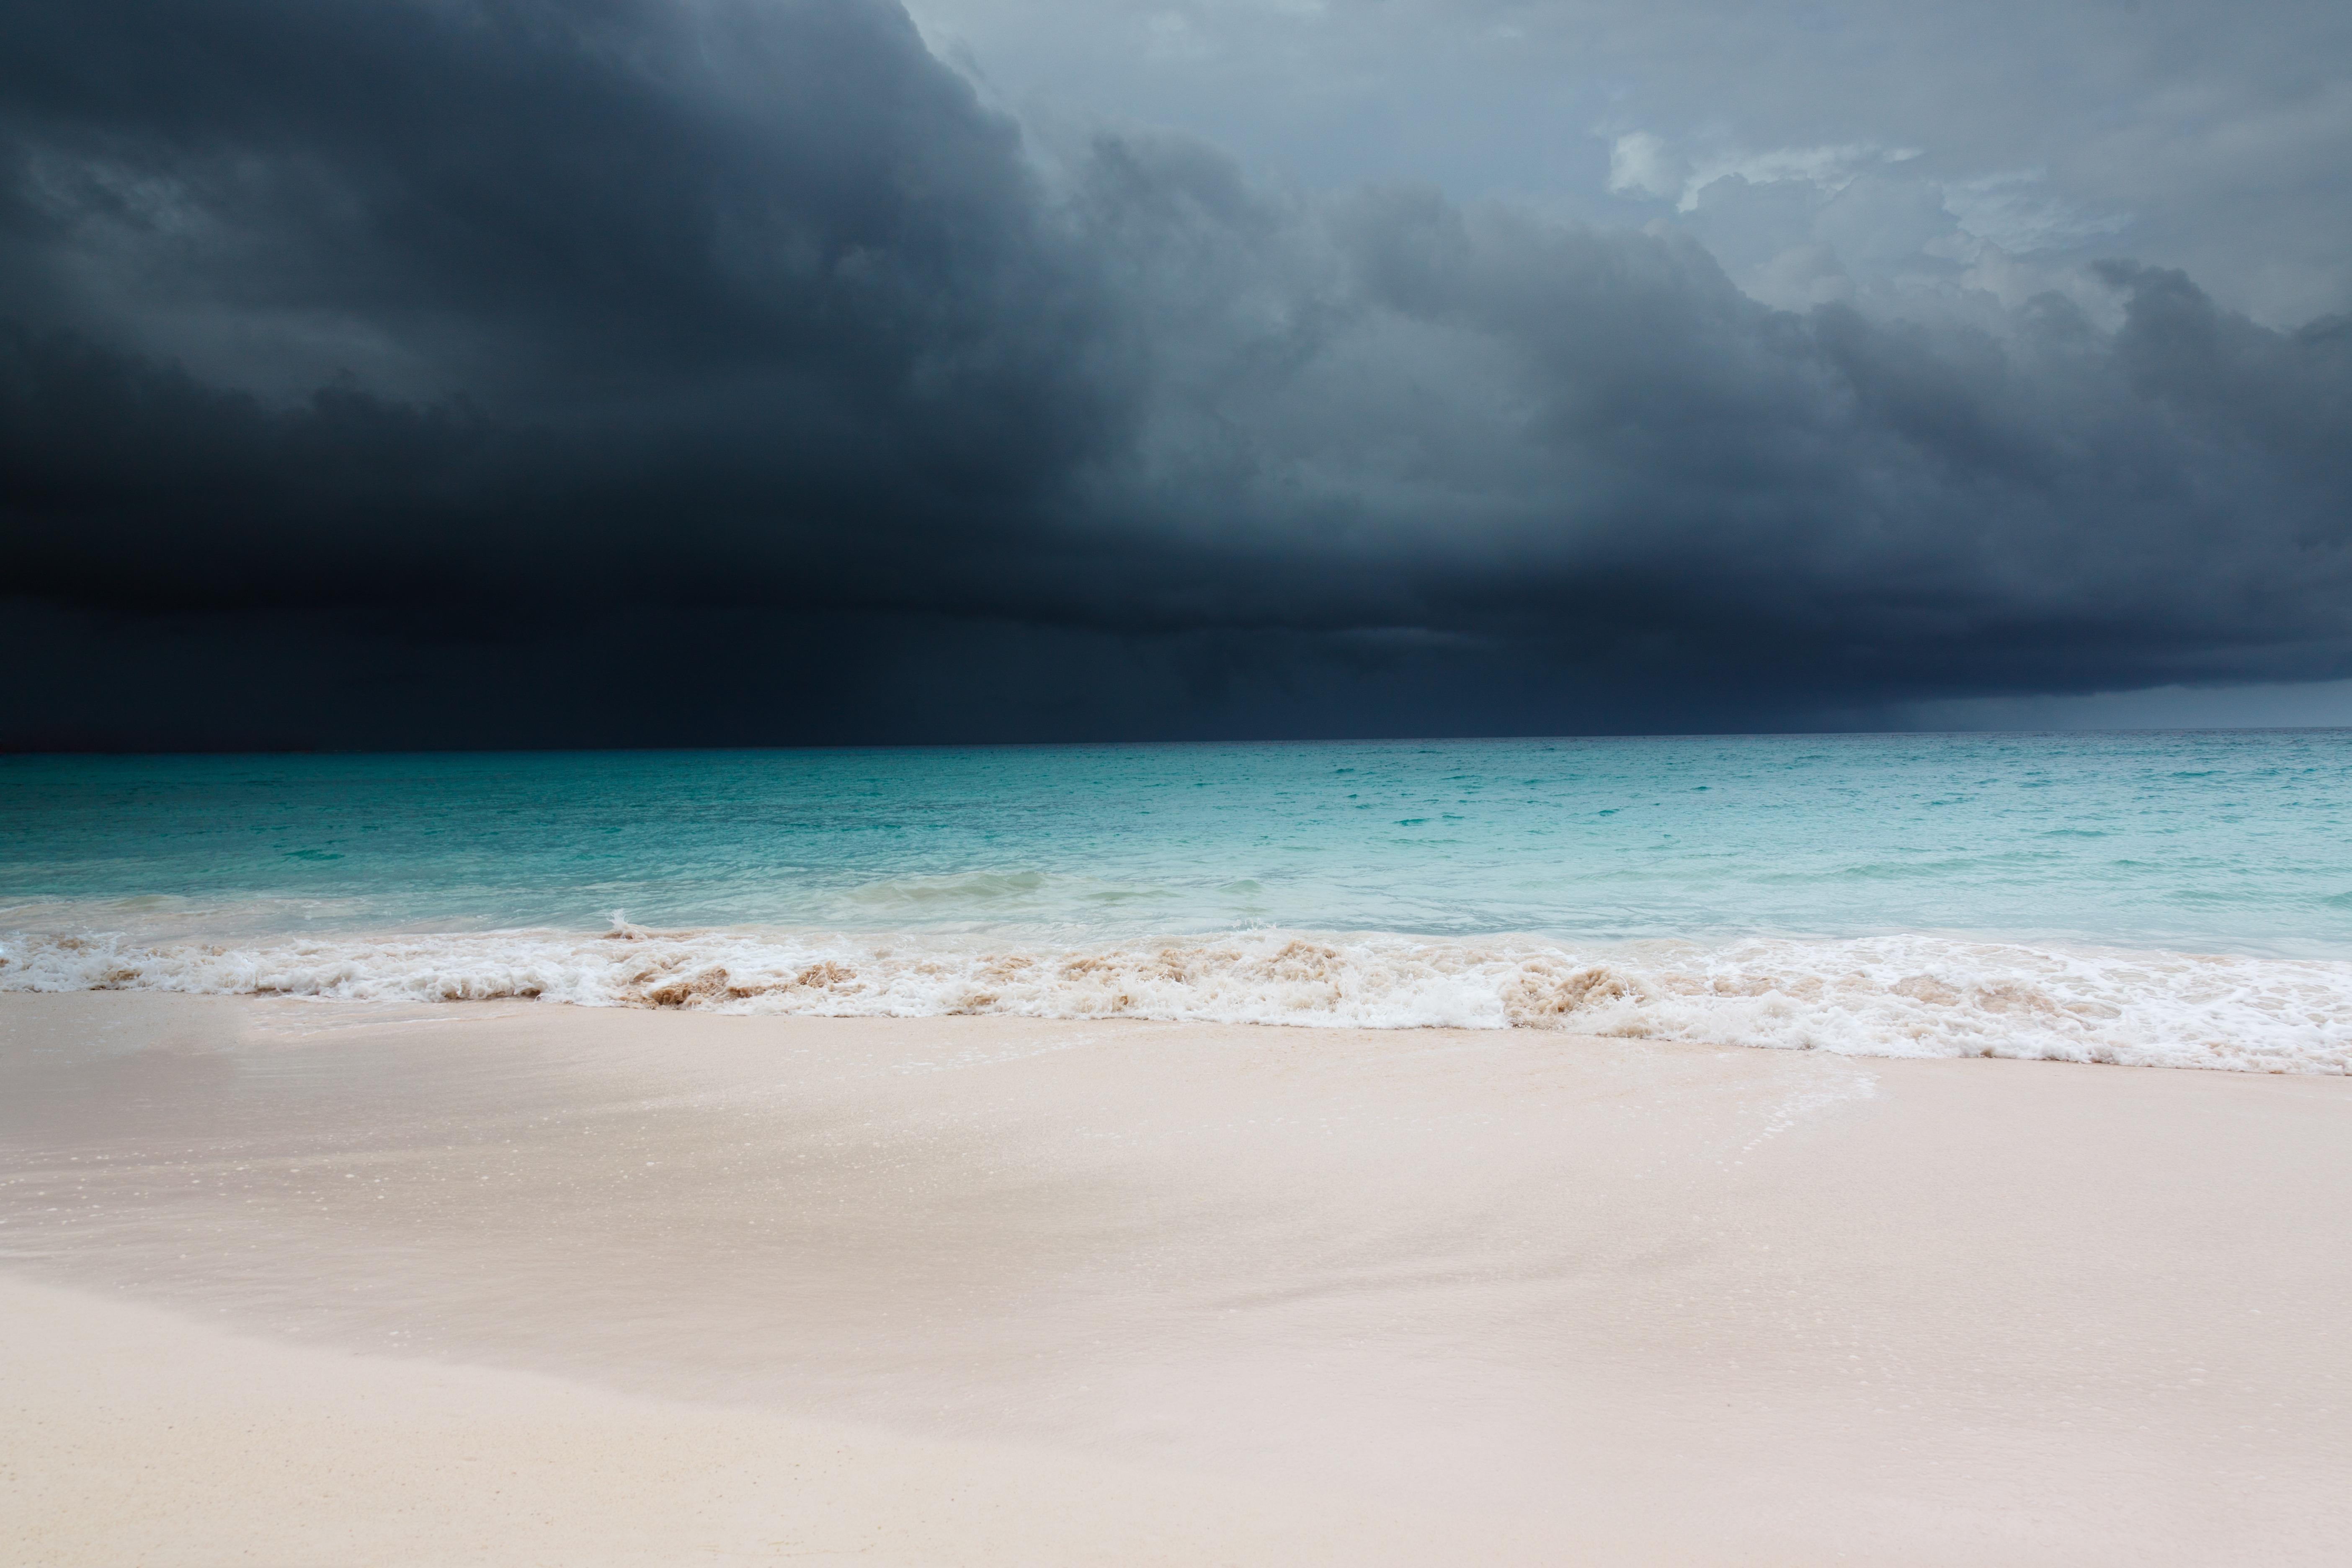 Beach And Ocean Storm: Free Images : Beach, Sea, Coast, Sand, Ocean, Horizon